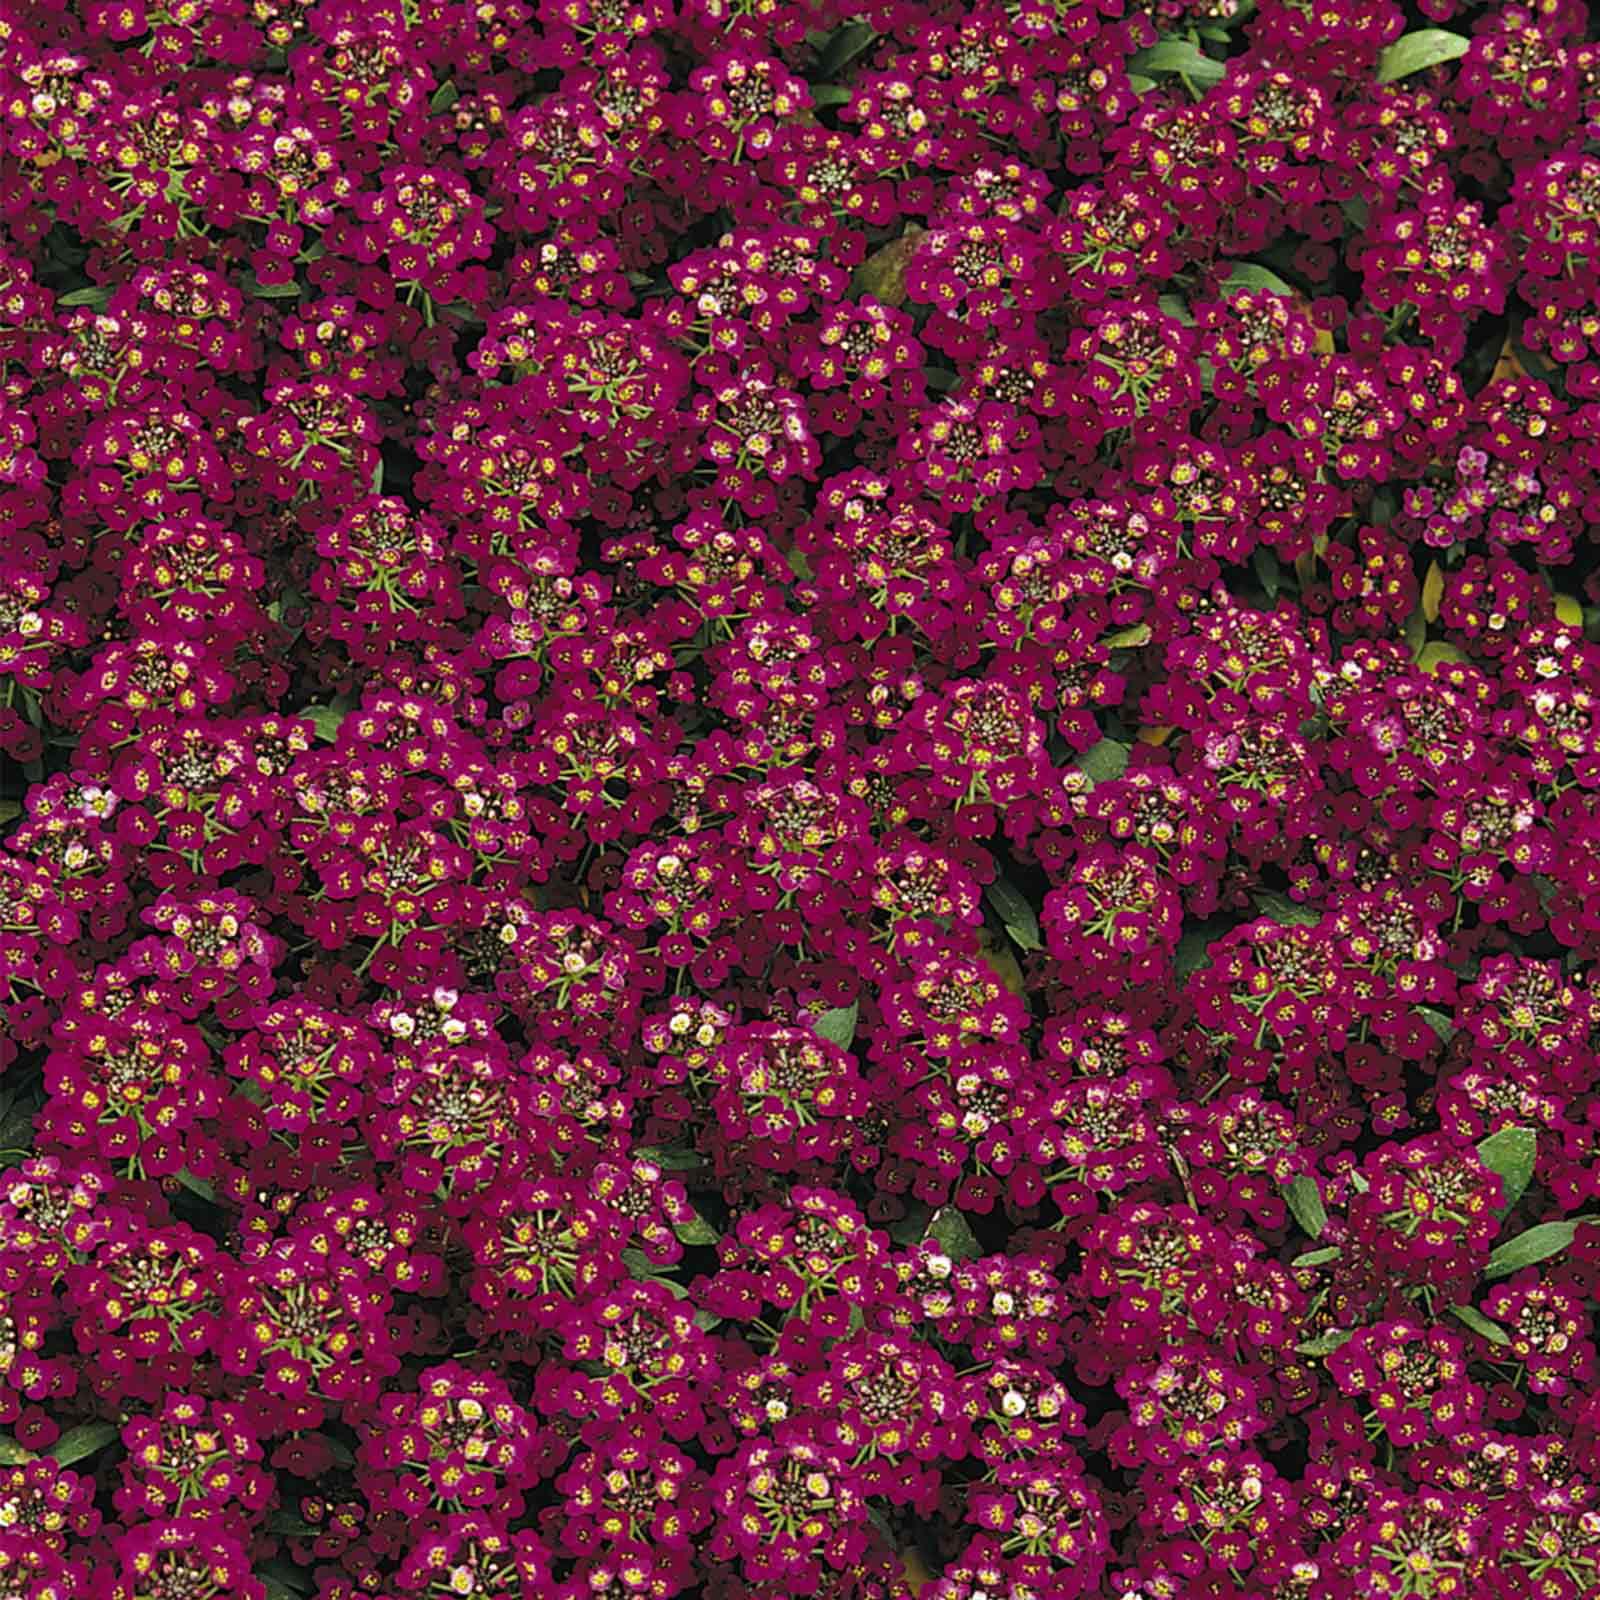 Alyssum Easter Bonnet Seeds - Color: Violet - Approx 5000 Annual Flower Garden Seeds - Lobularia maritima